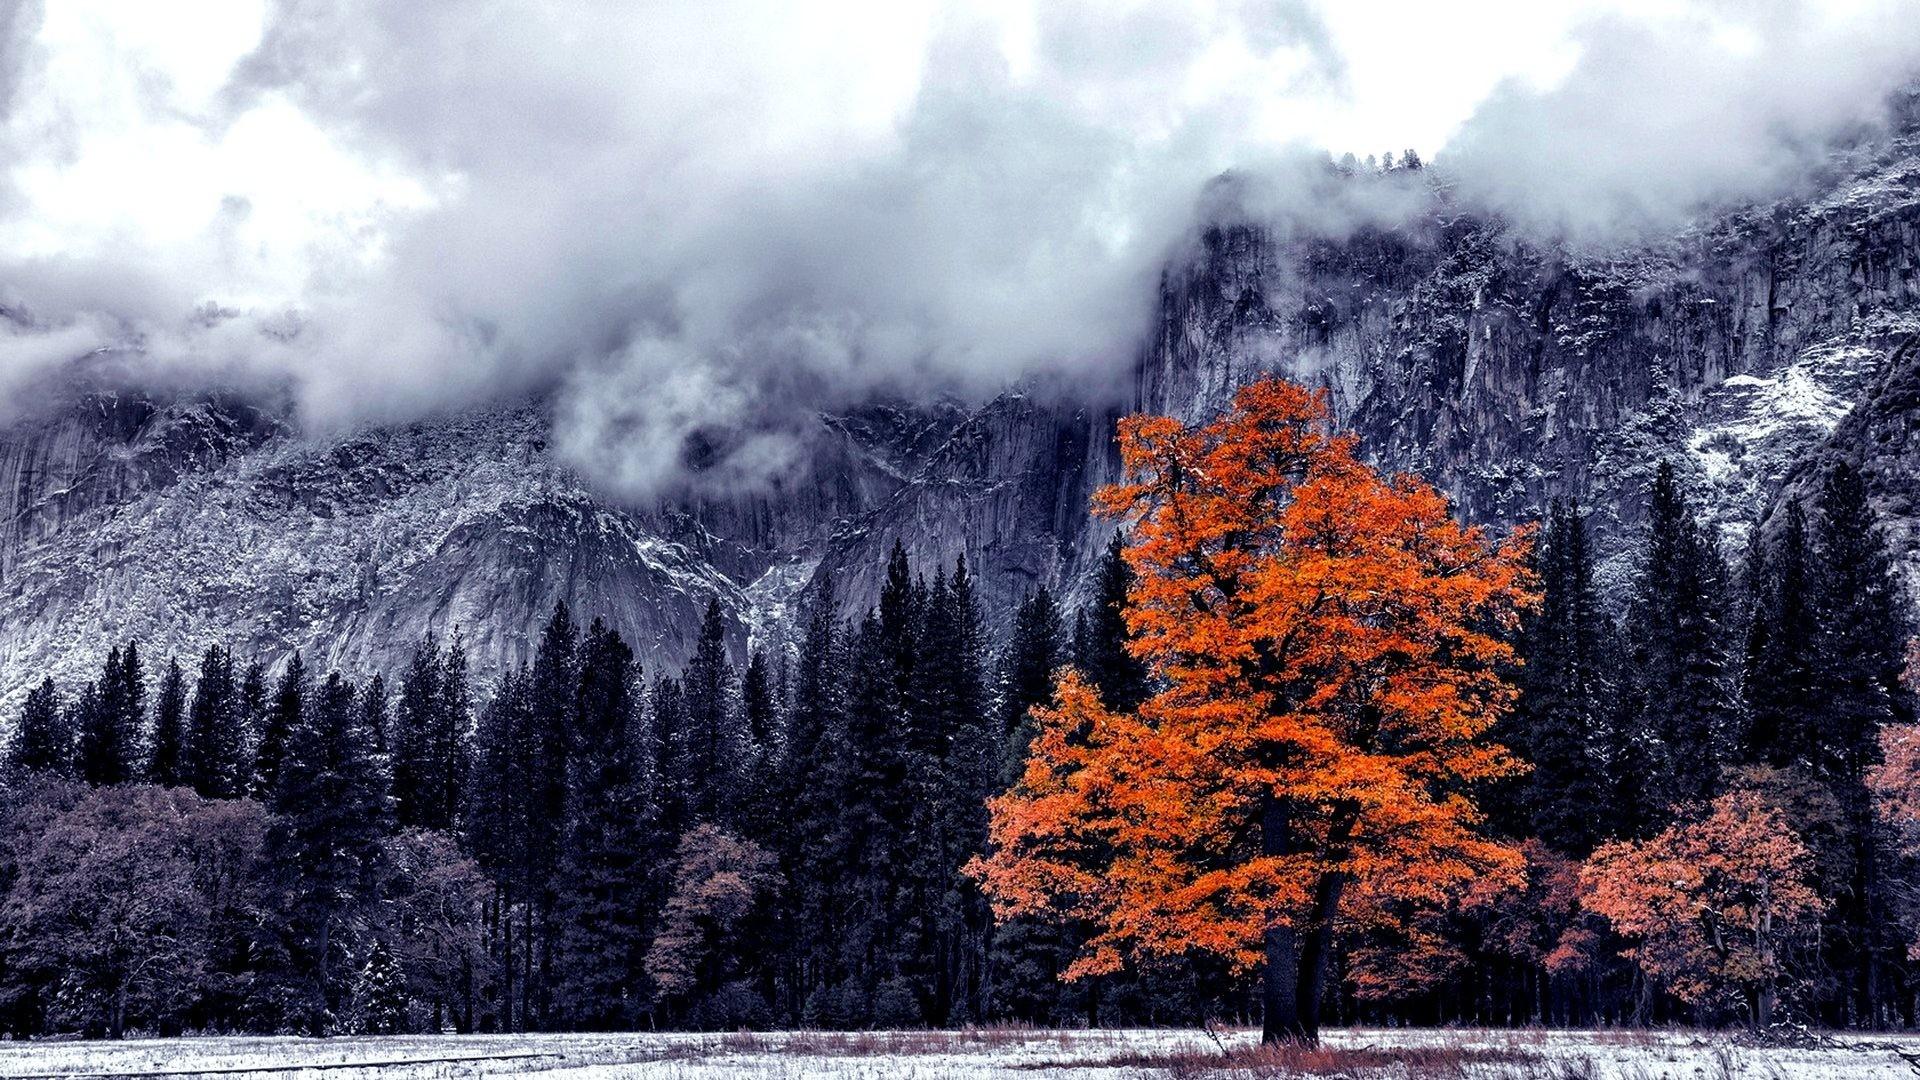 Winter – LAST AUTUMN TREE Landscape Mountain Wallpaper Winter Download Free  for HD 16:9